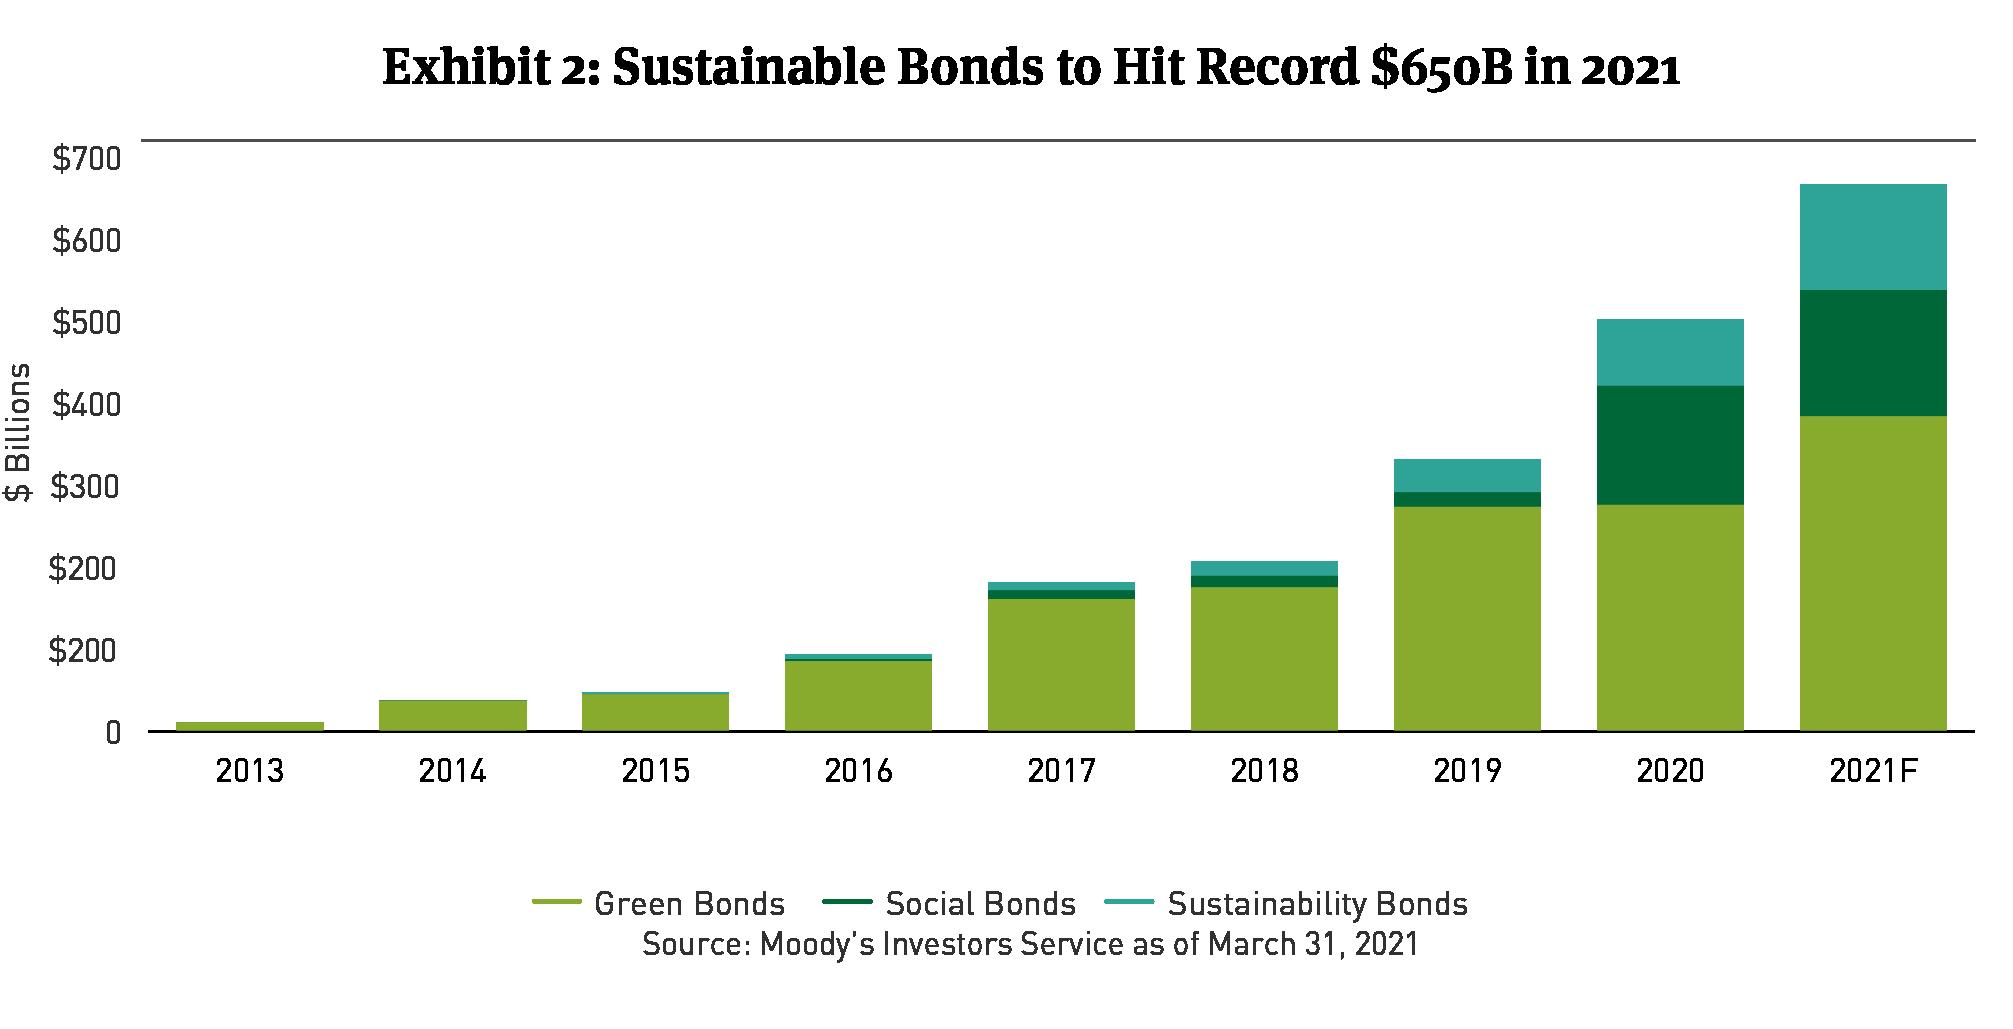 sustainable bond issuance